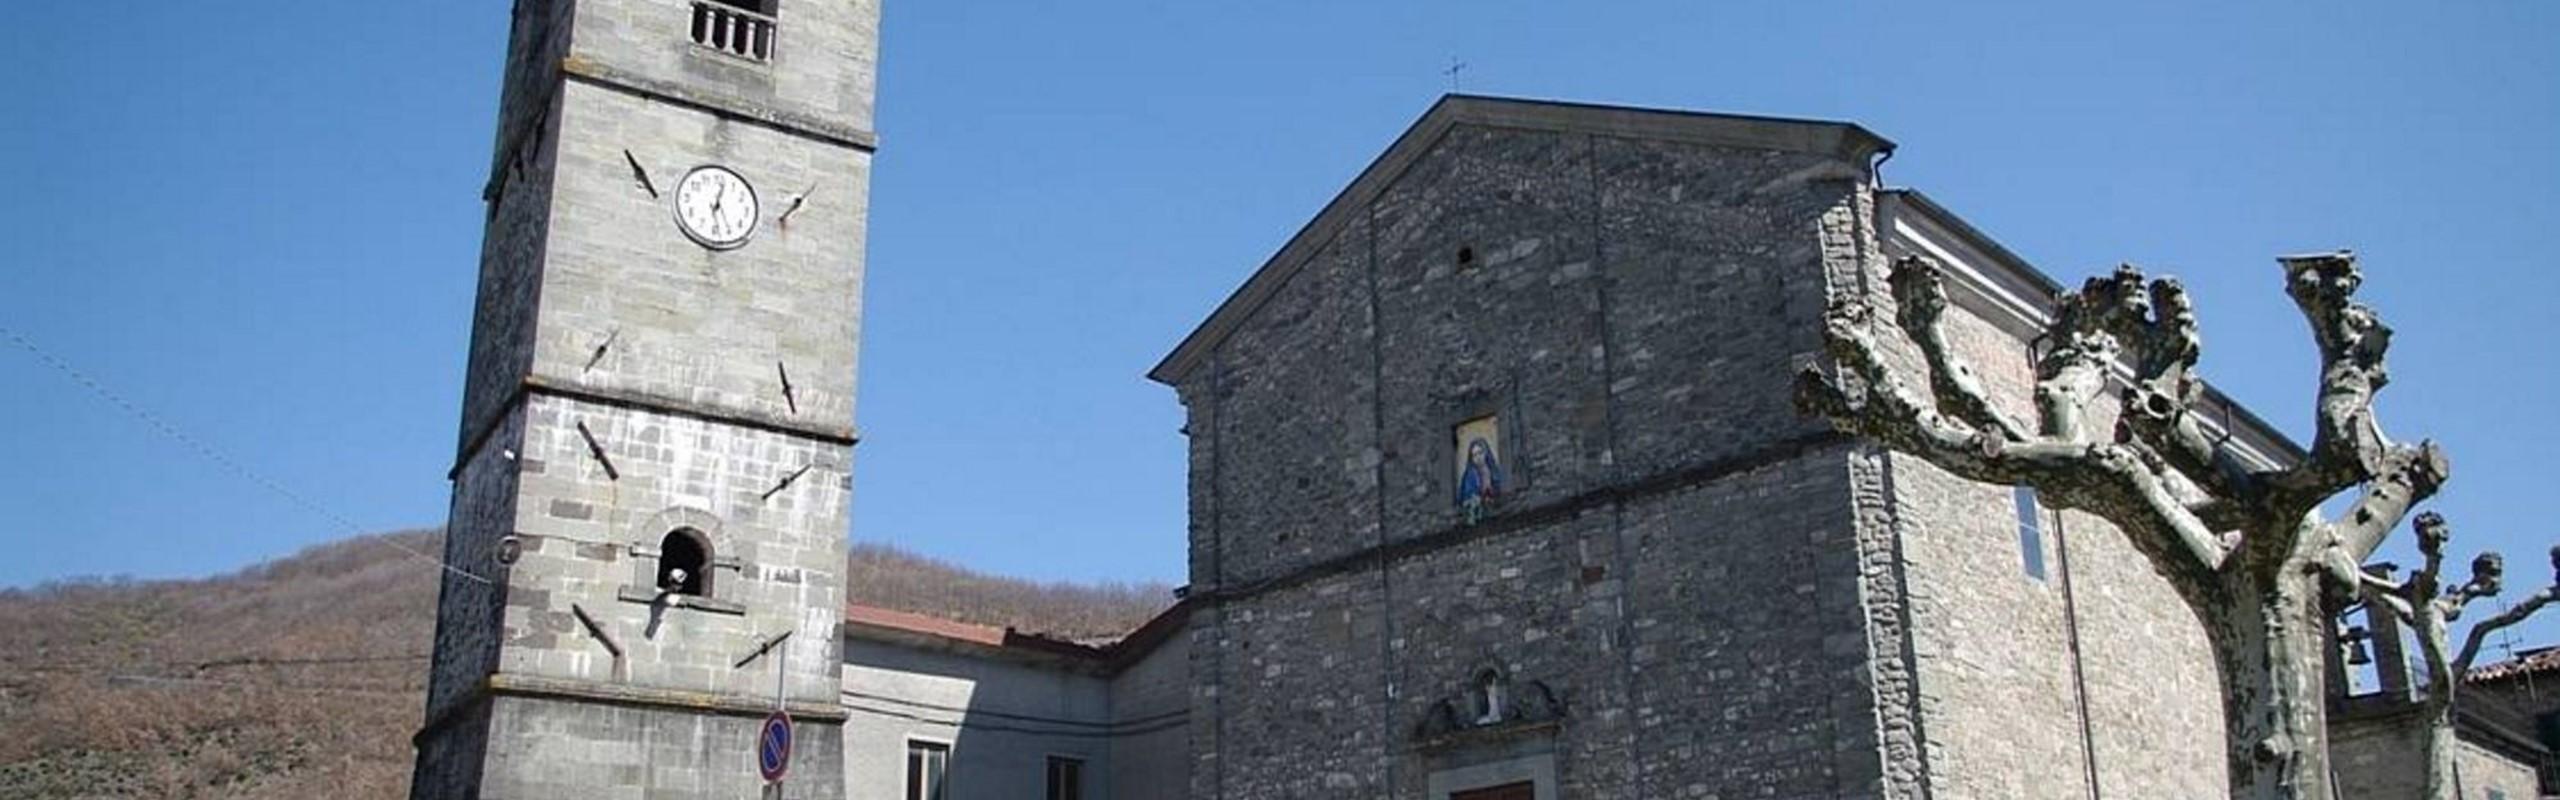 Tn Piazza Al Serchio San Pietro